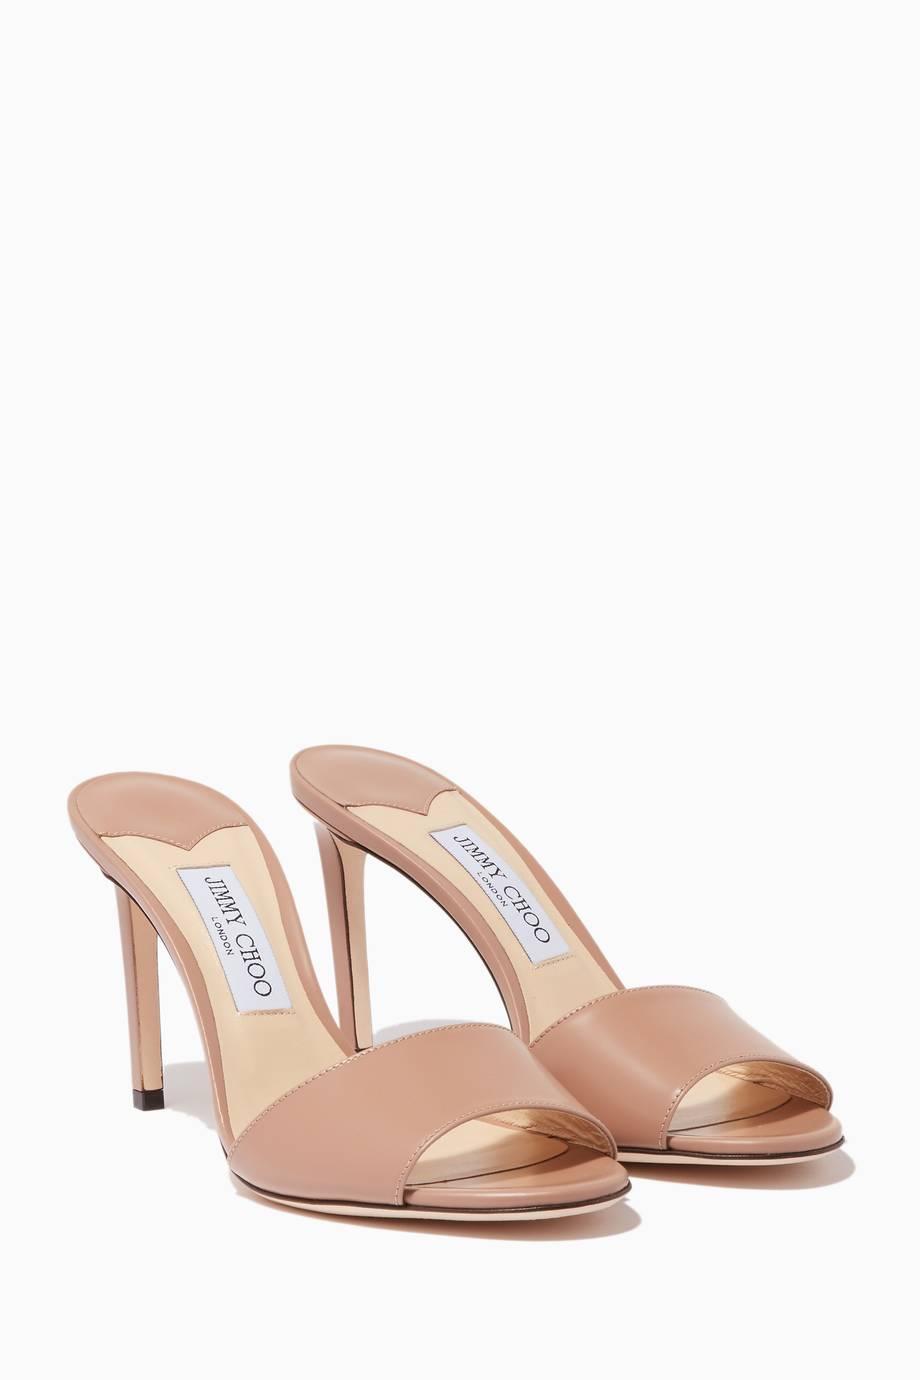 Sandals for Women On Sale, Black, suede, 2017, 4 4.5 5.5 7.5 Jimmy Choo London